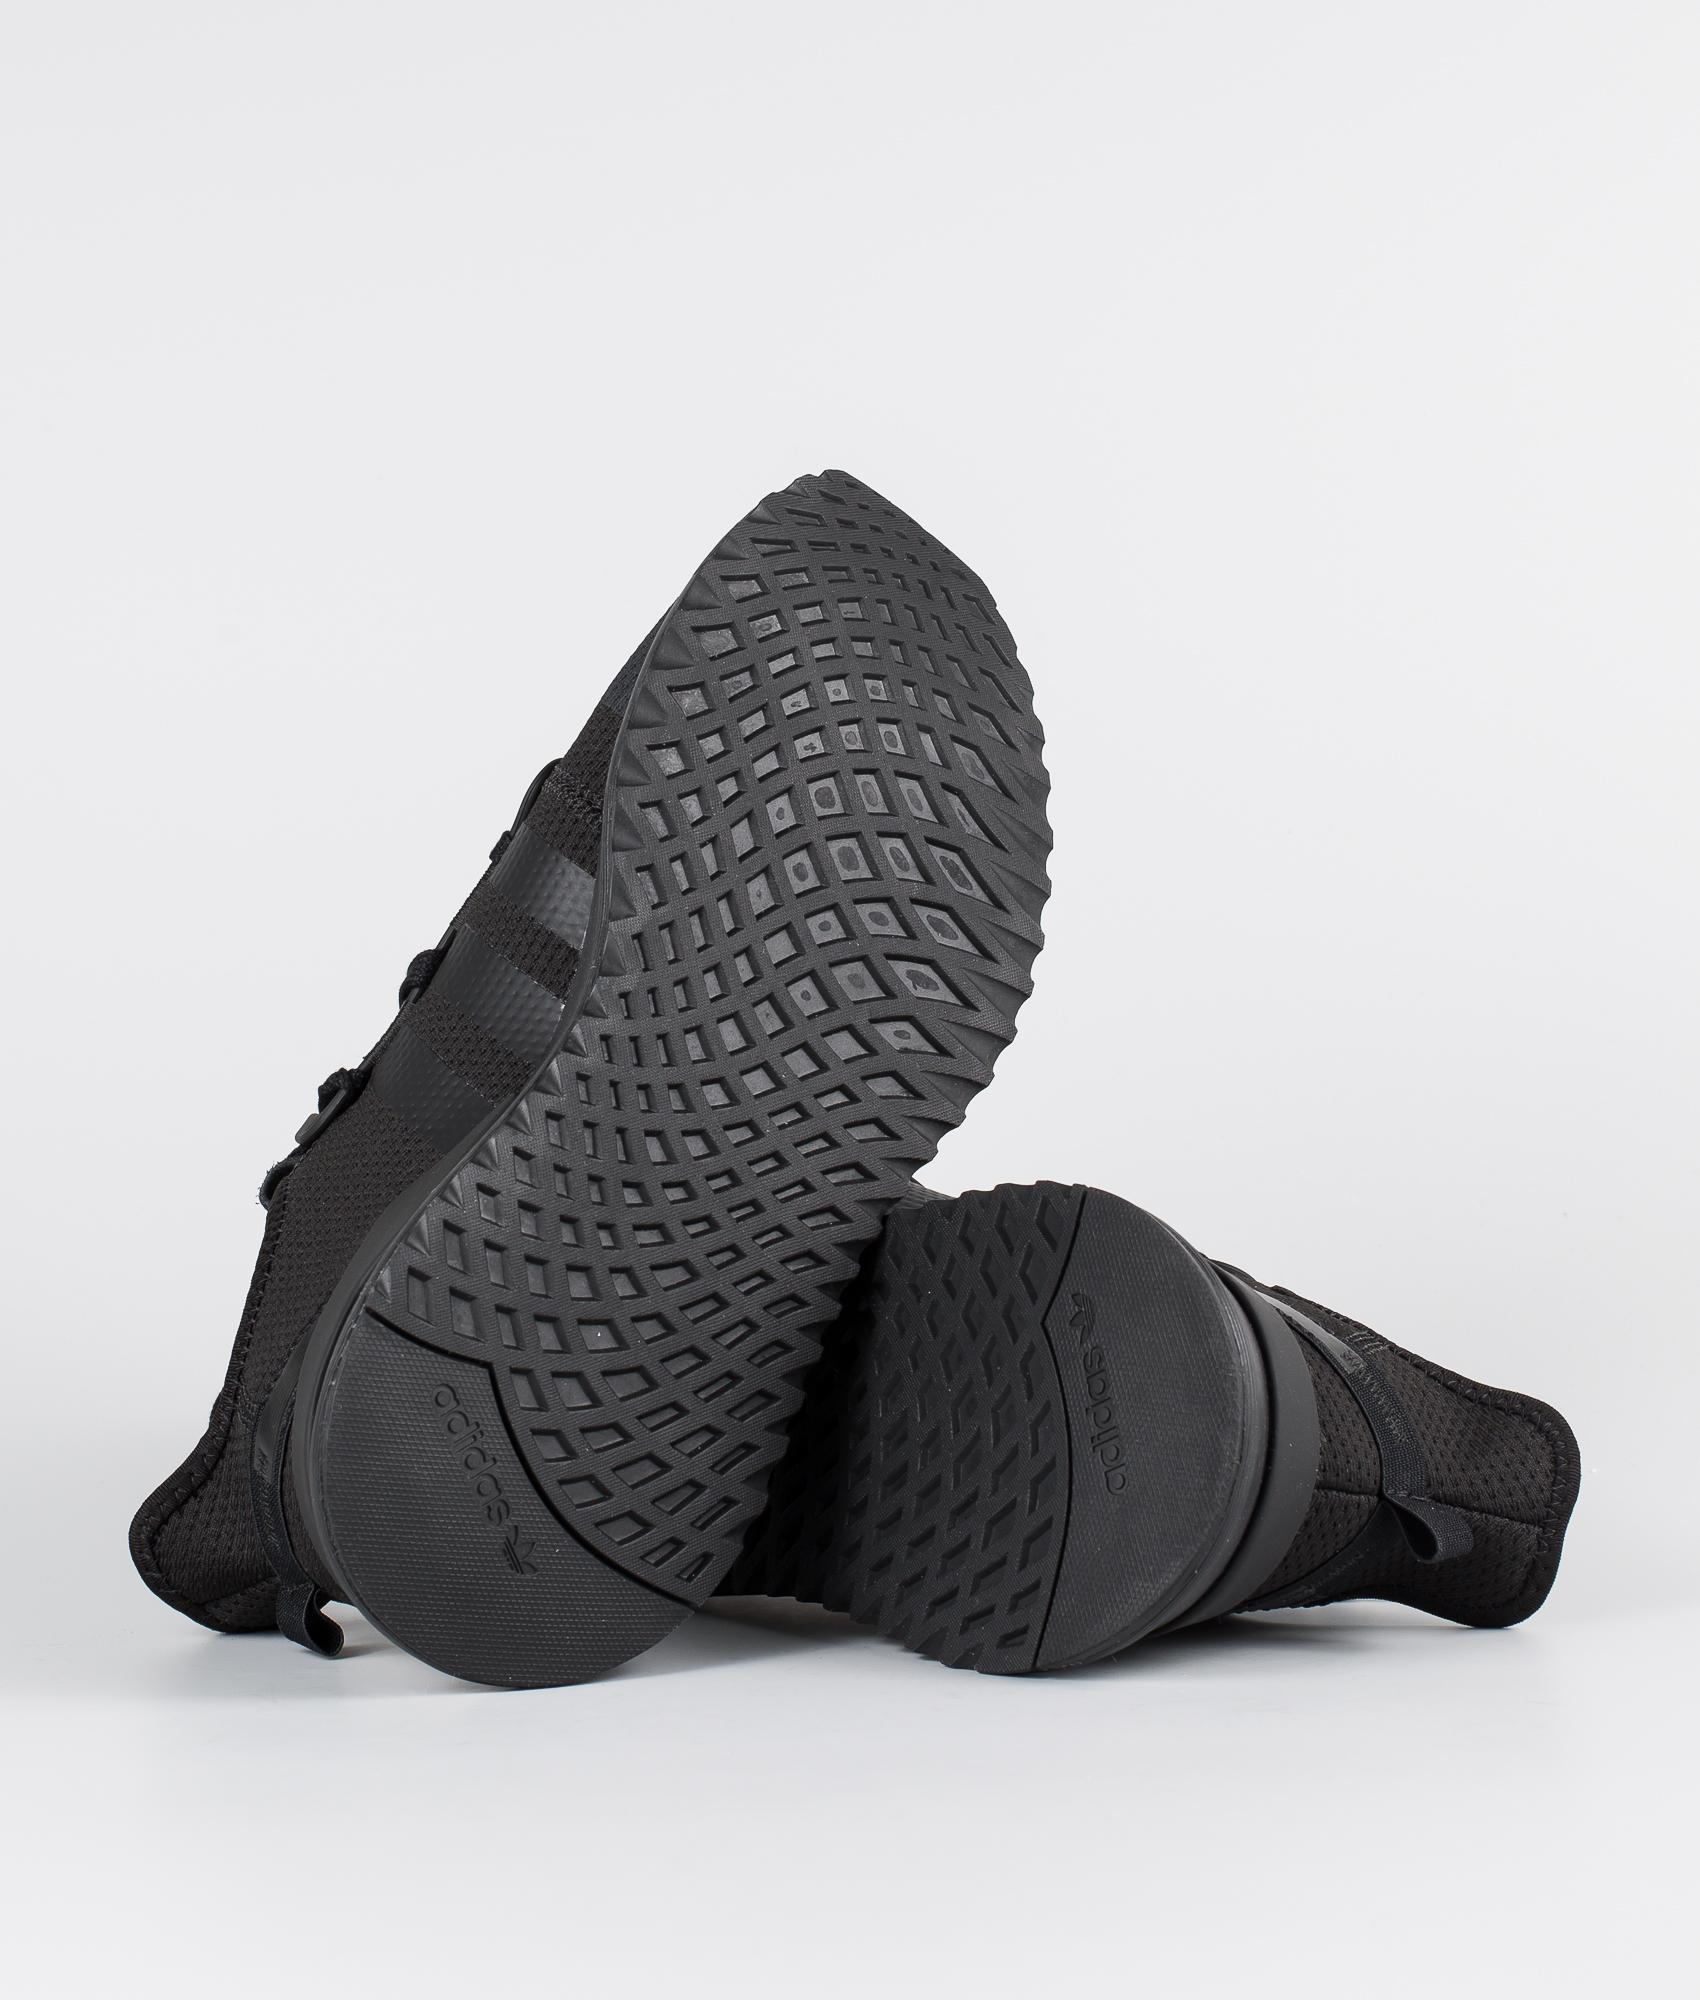 U Core Black Originals Schuhe Blackcore Adidas path Run wOkiPZuXT